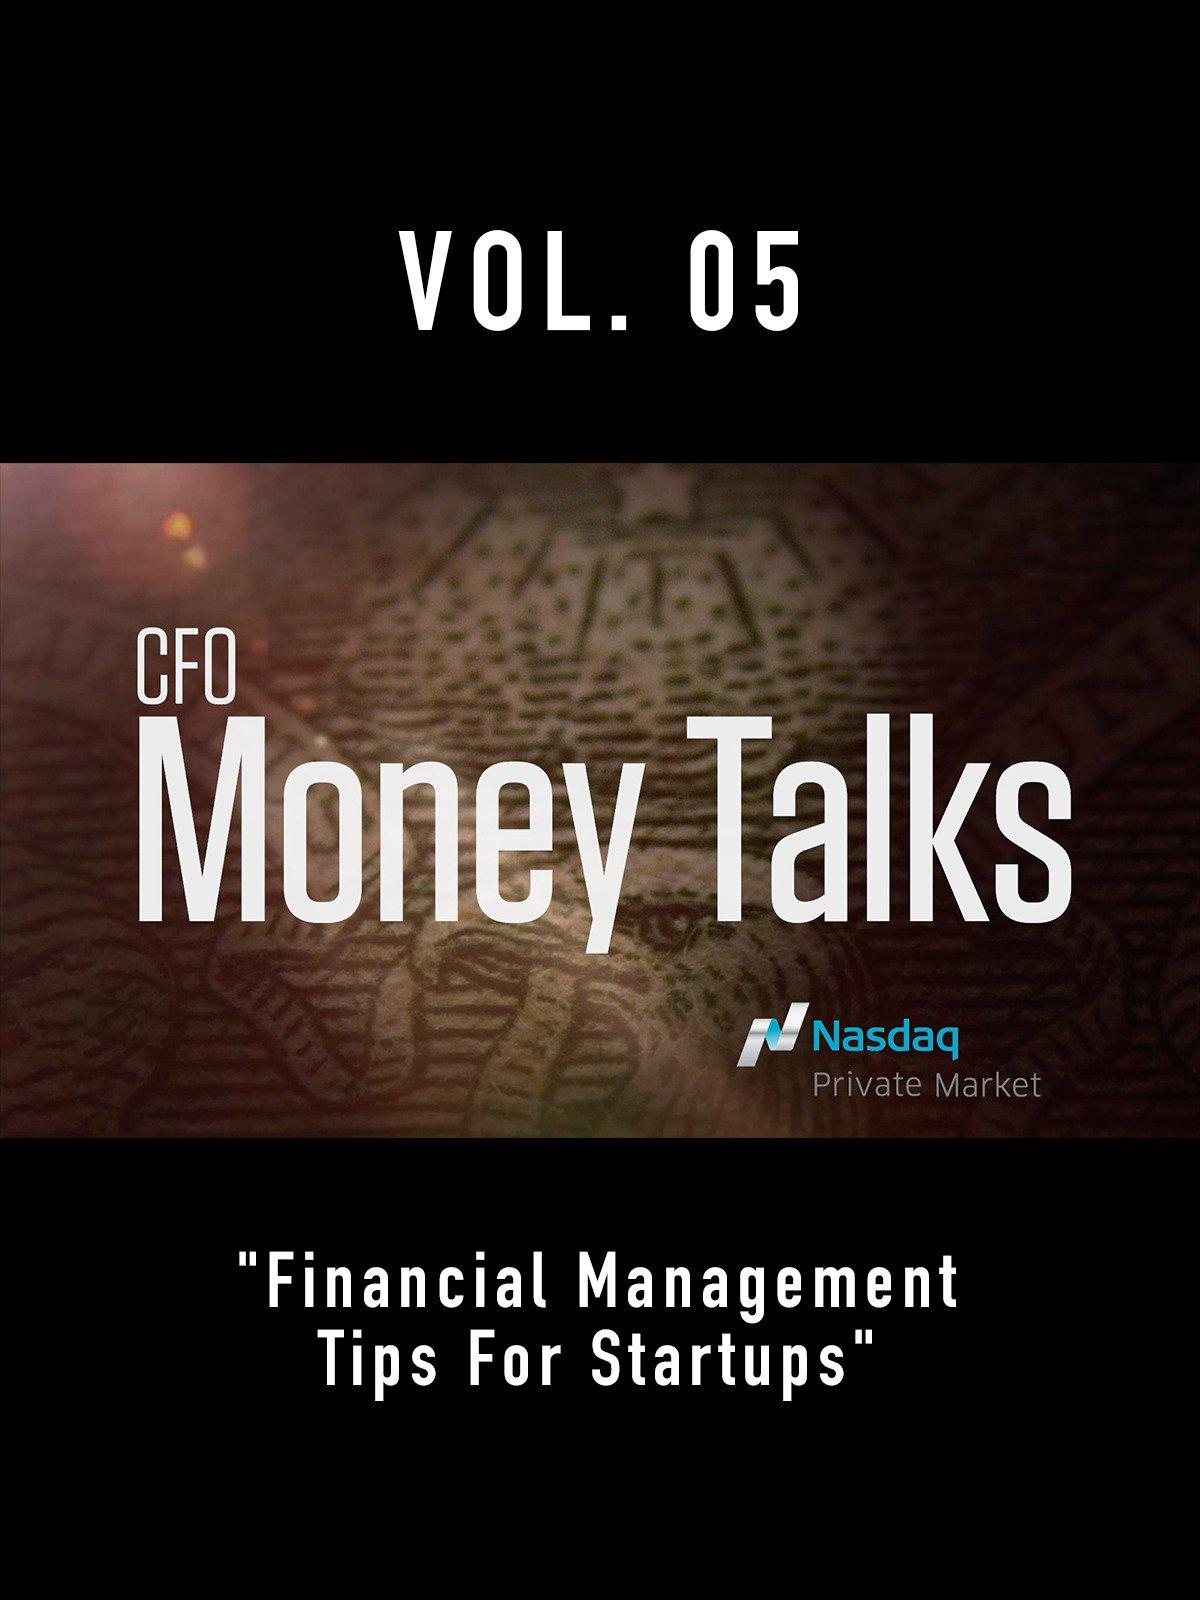 CFO Money Talks Vol. 05